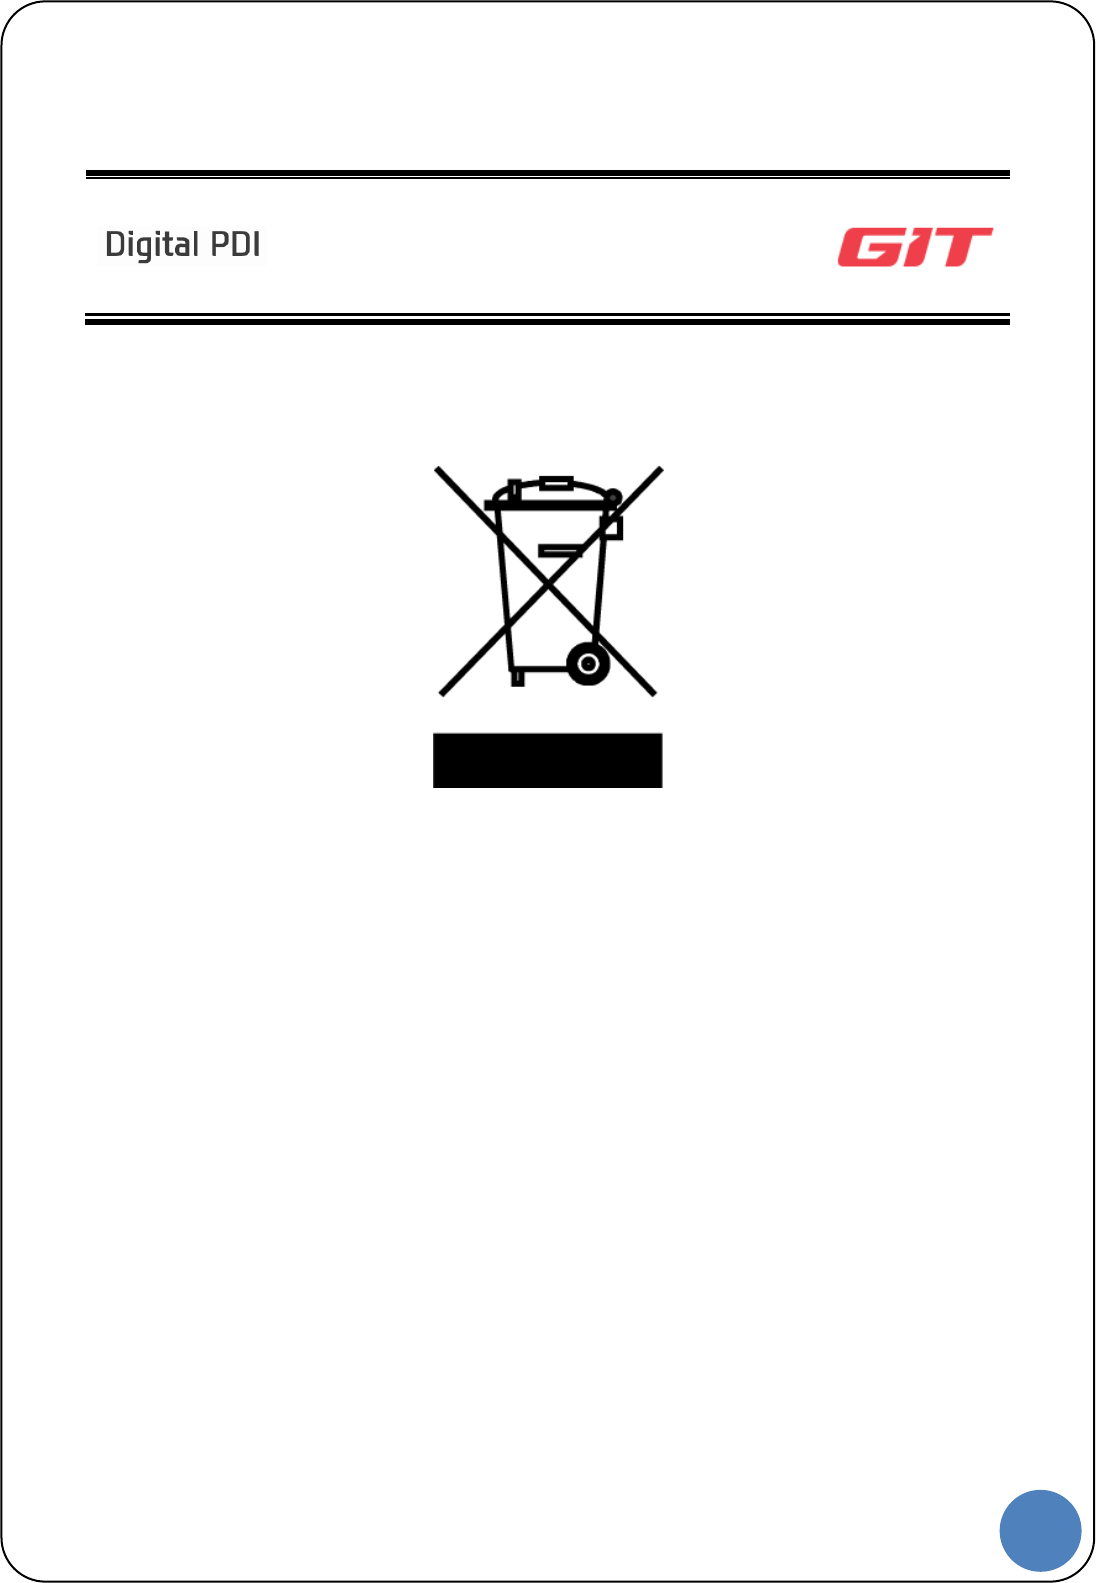 GIT G1QDDMM008 Scan Tool User Manual